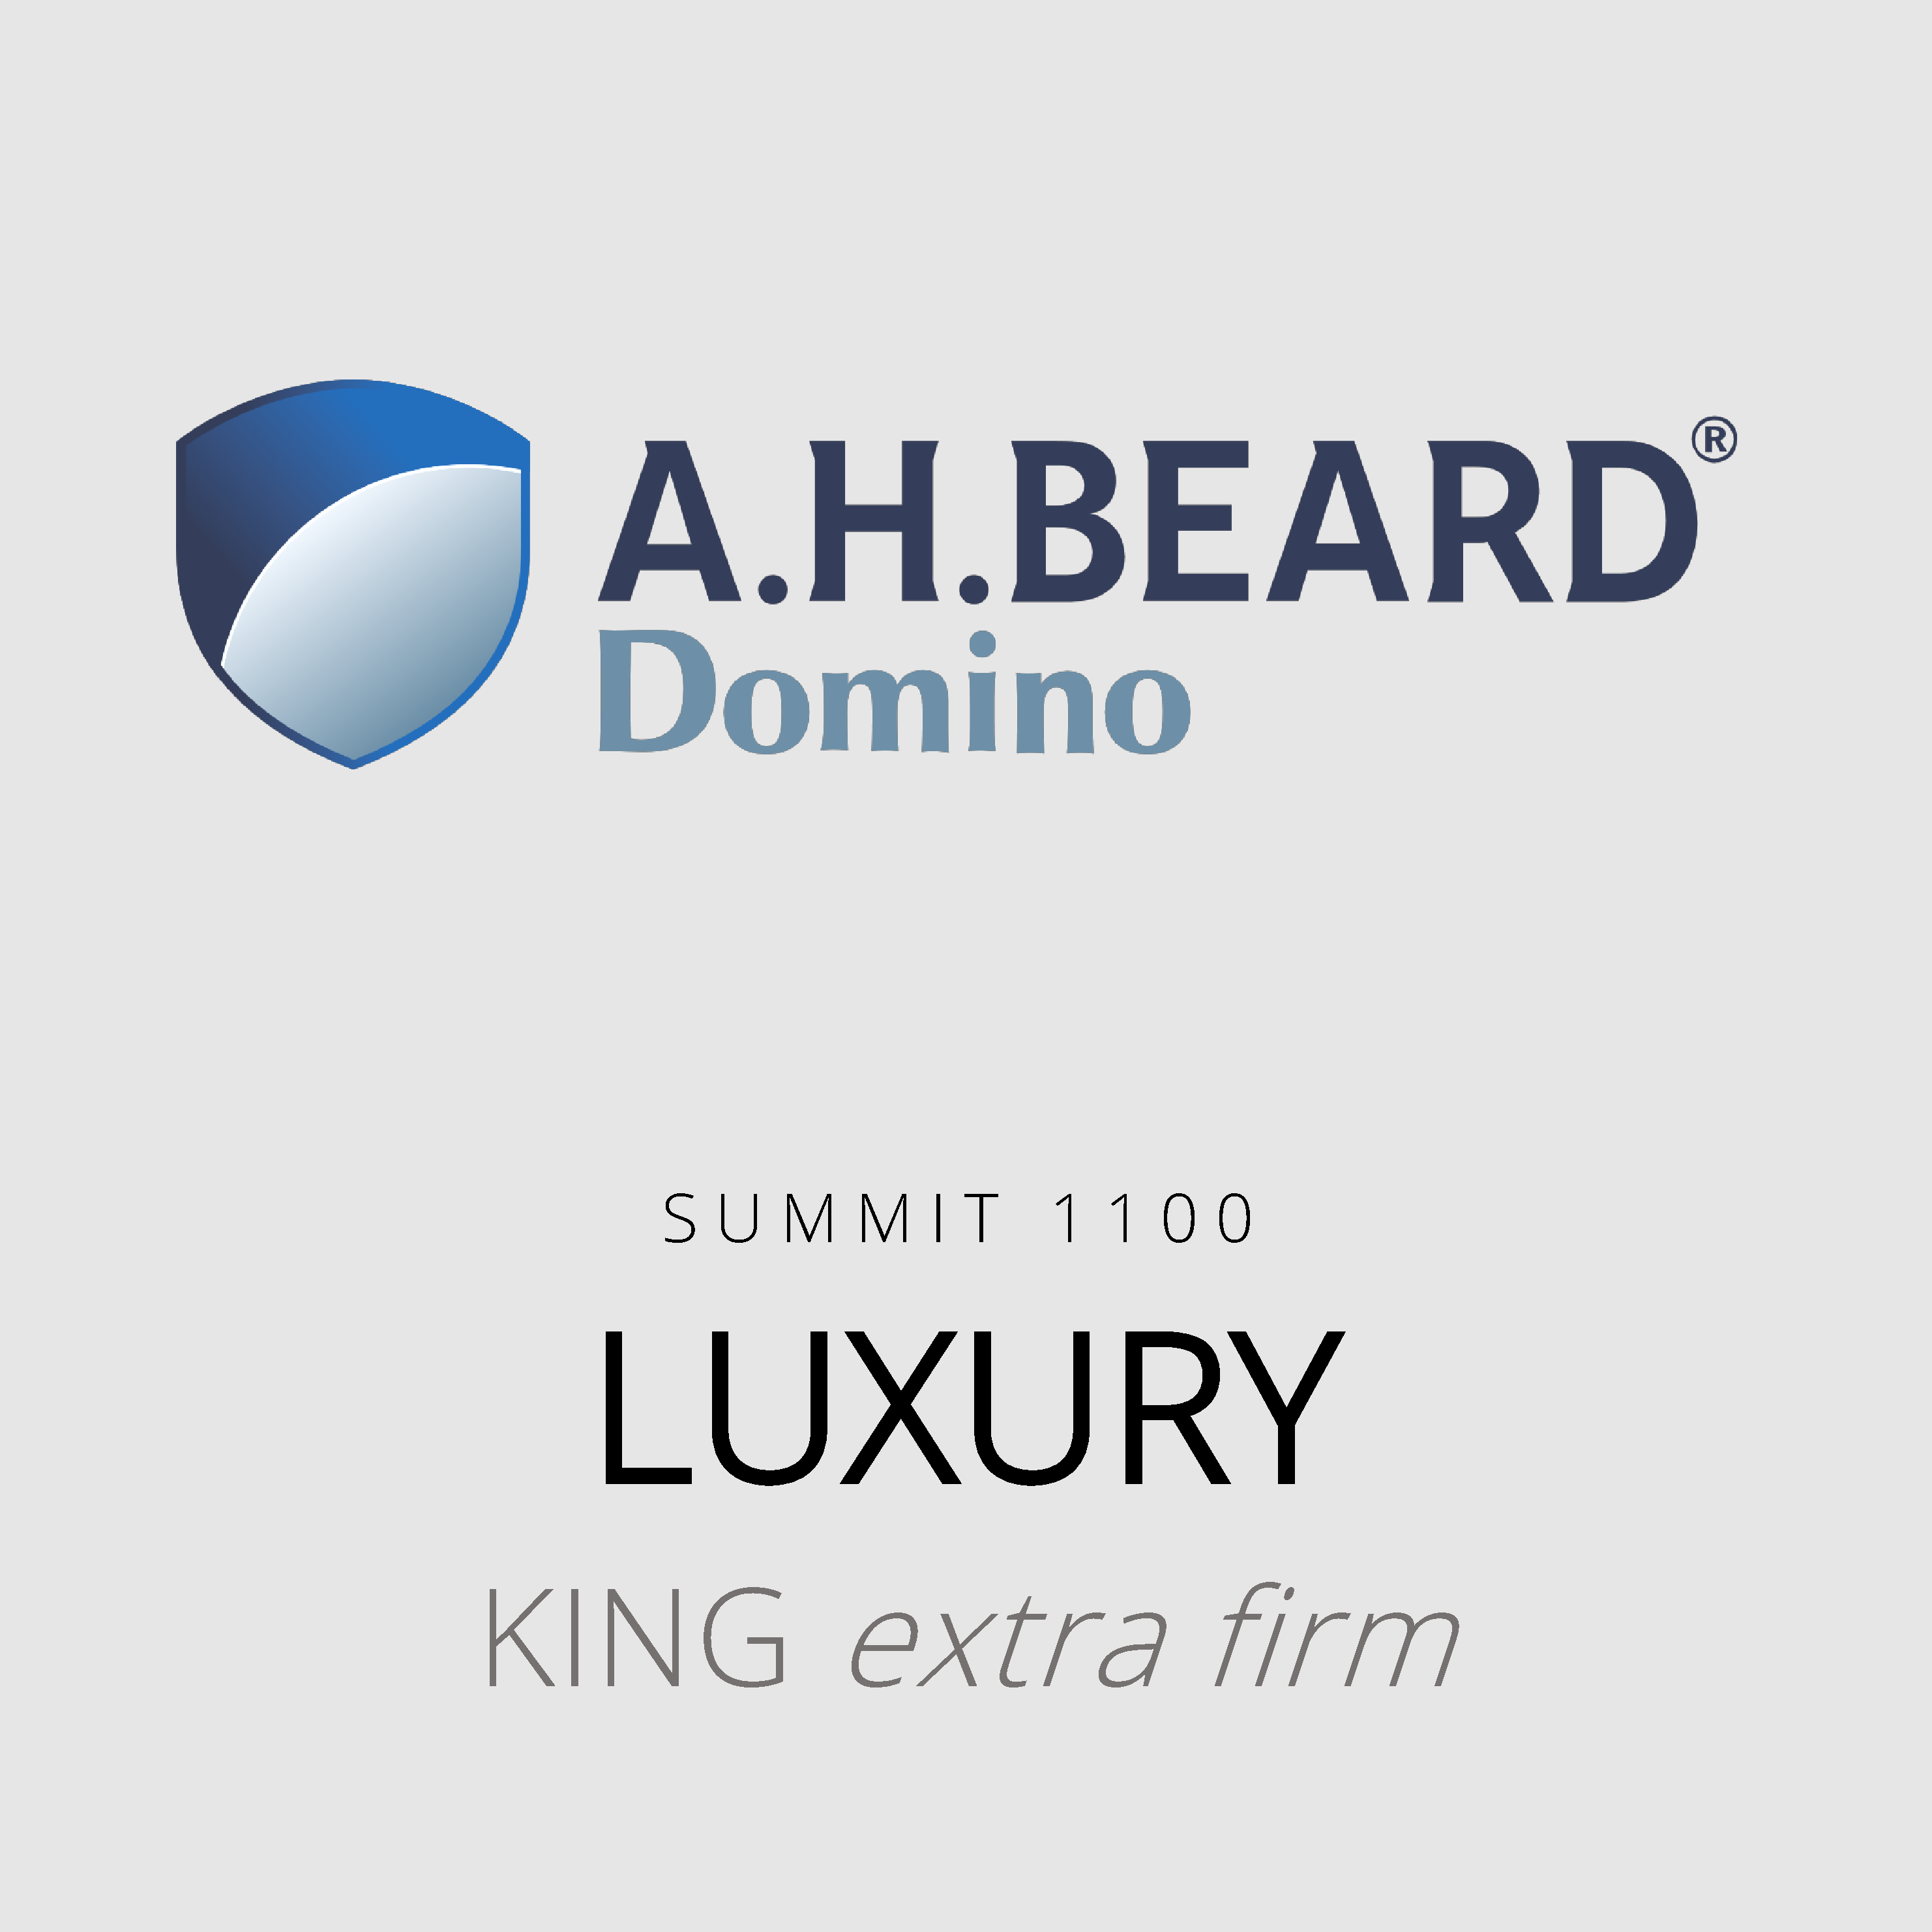 AH Beard Domino – Luxury – Summit 1100 – King Extra Firm Mattress